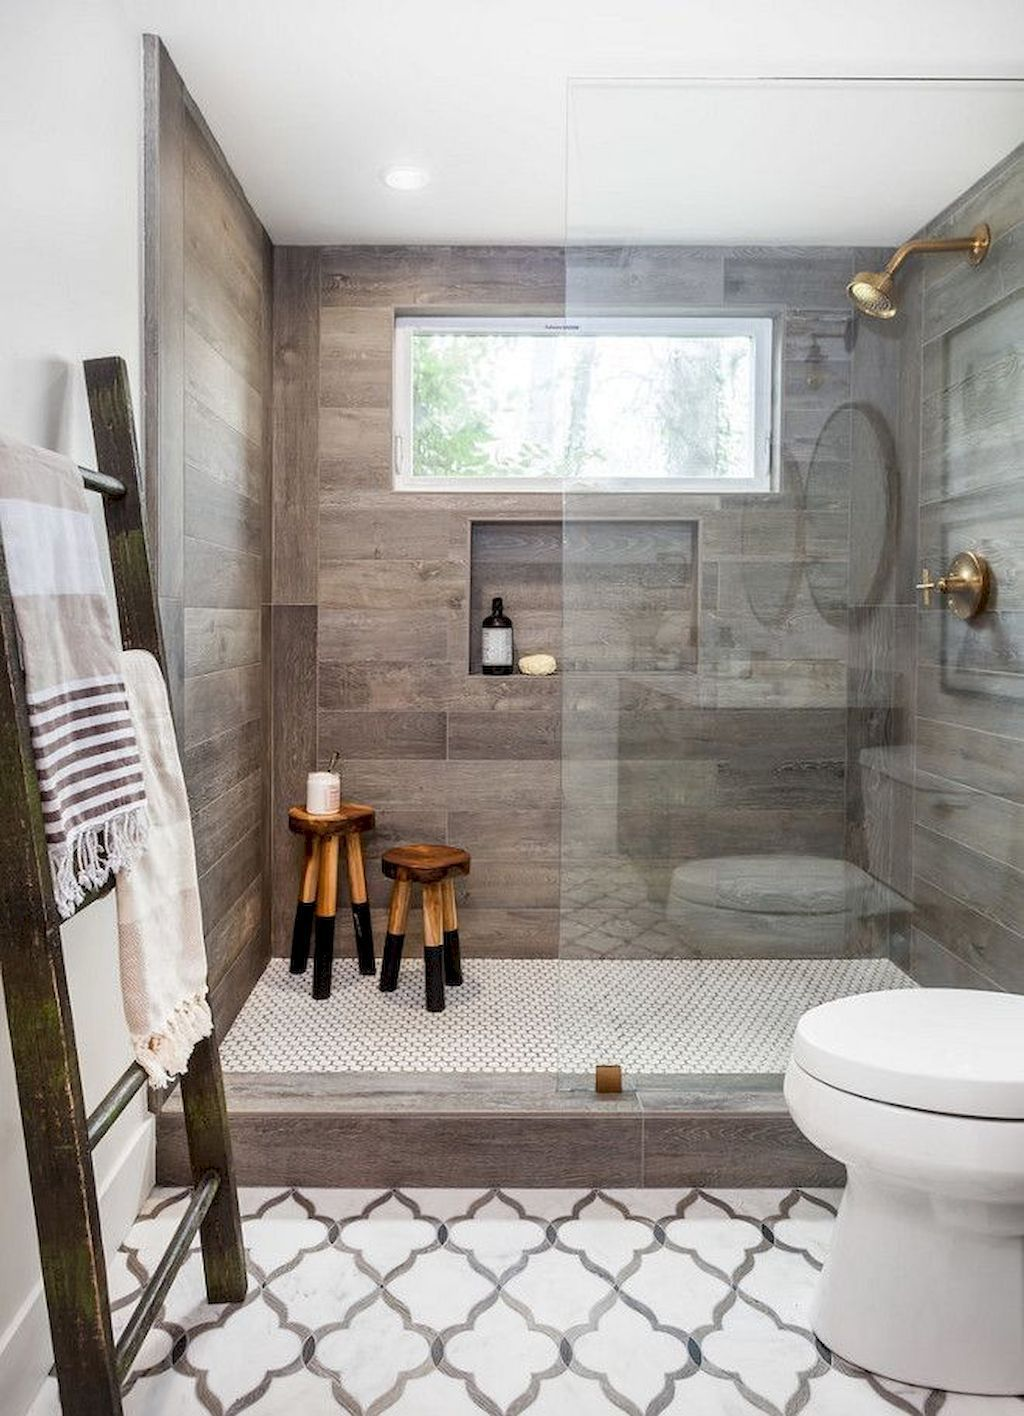 Small master bathroom tile makeover design ideas 16